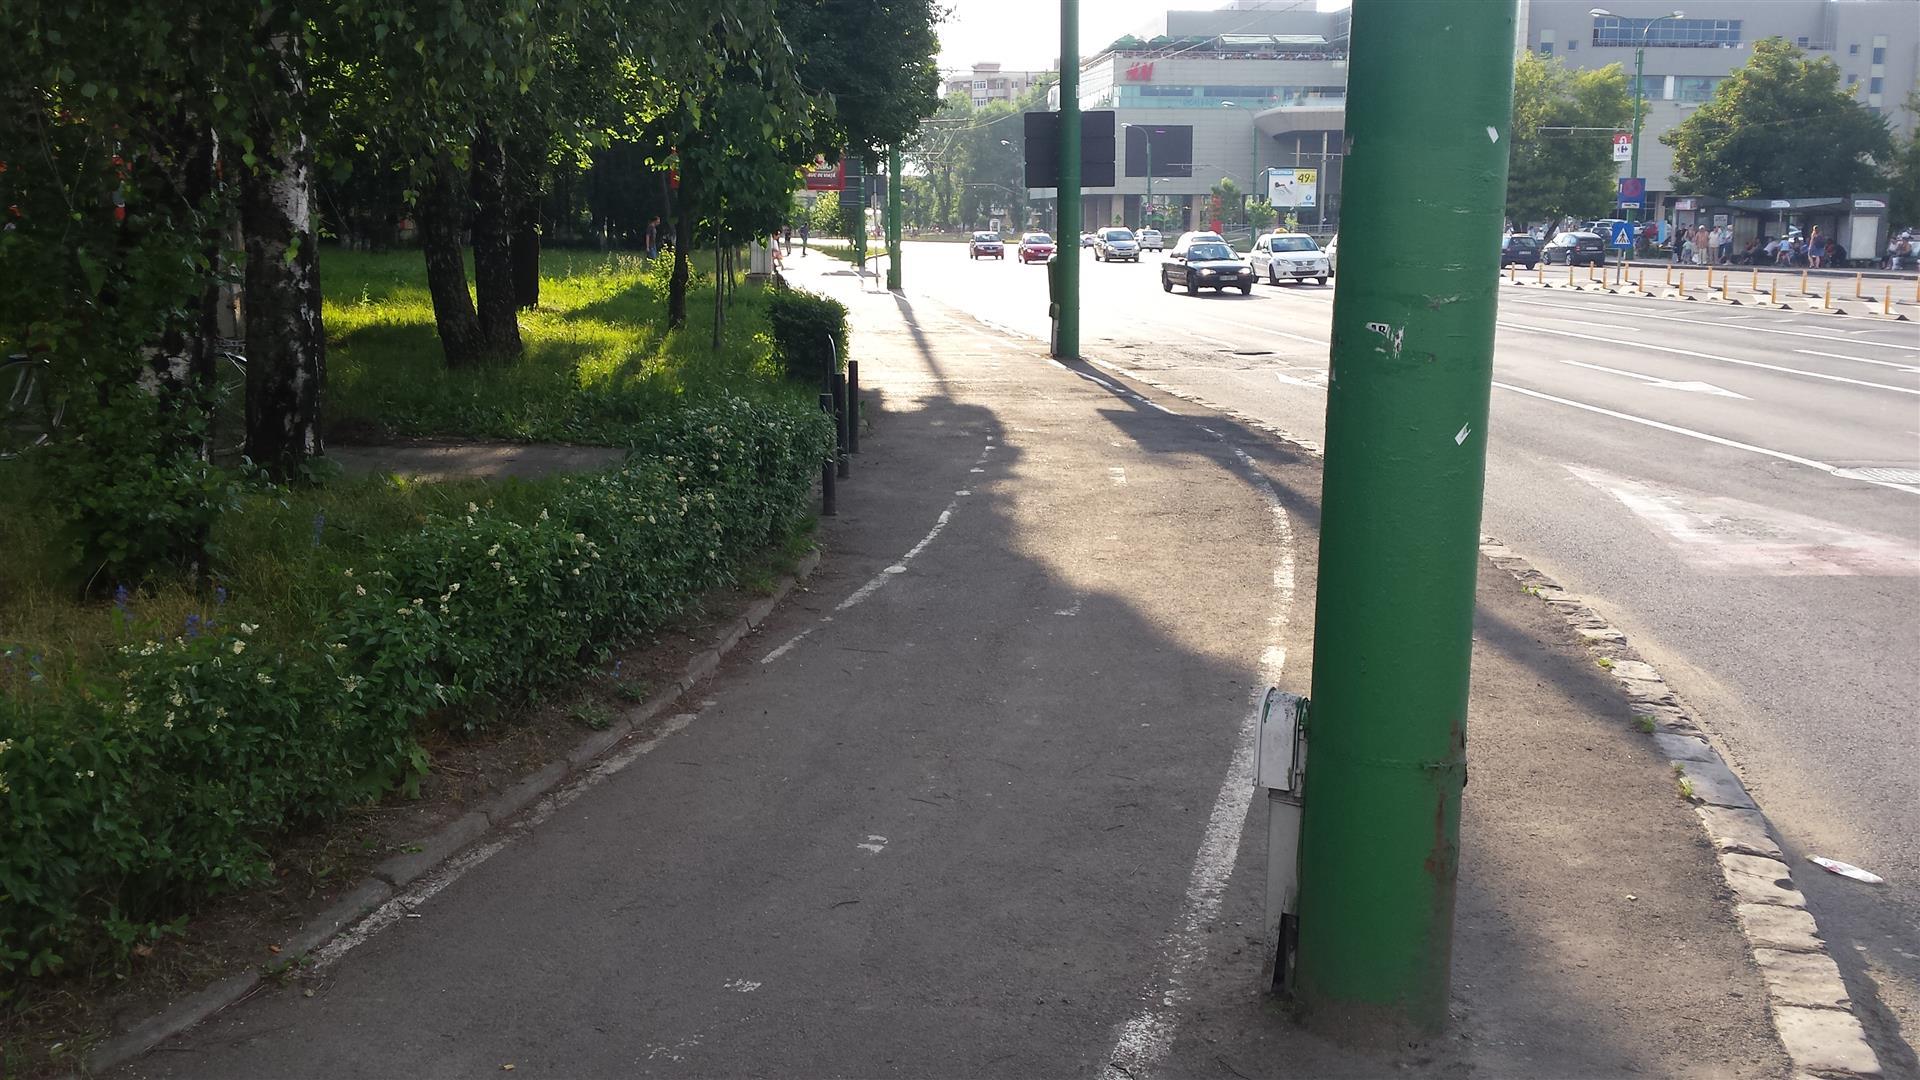 piste-biciclete-brasov-iunie-2015 (3) (Large)